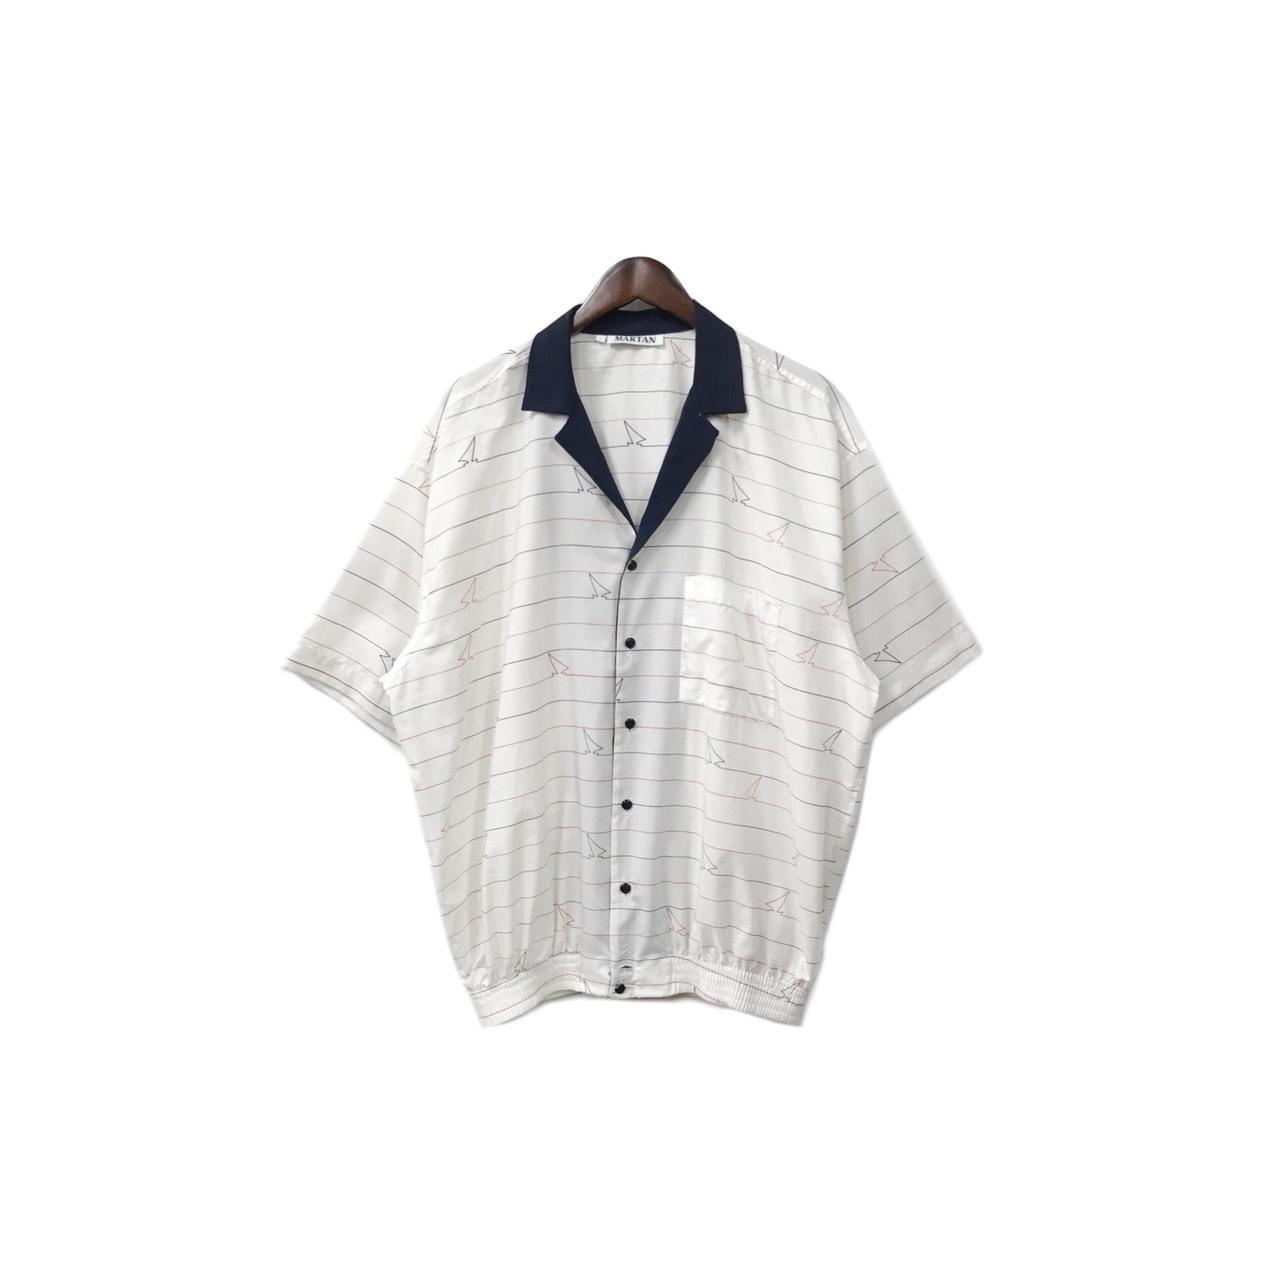 USED - Graphic Design Shirt ¥9000+tax → ¥7200+tax